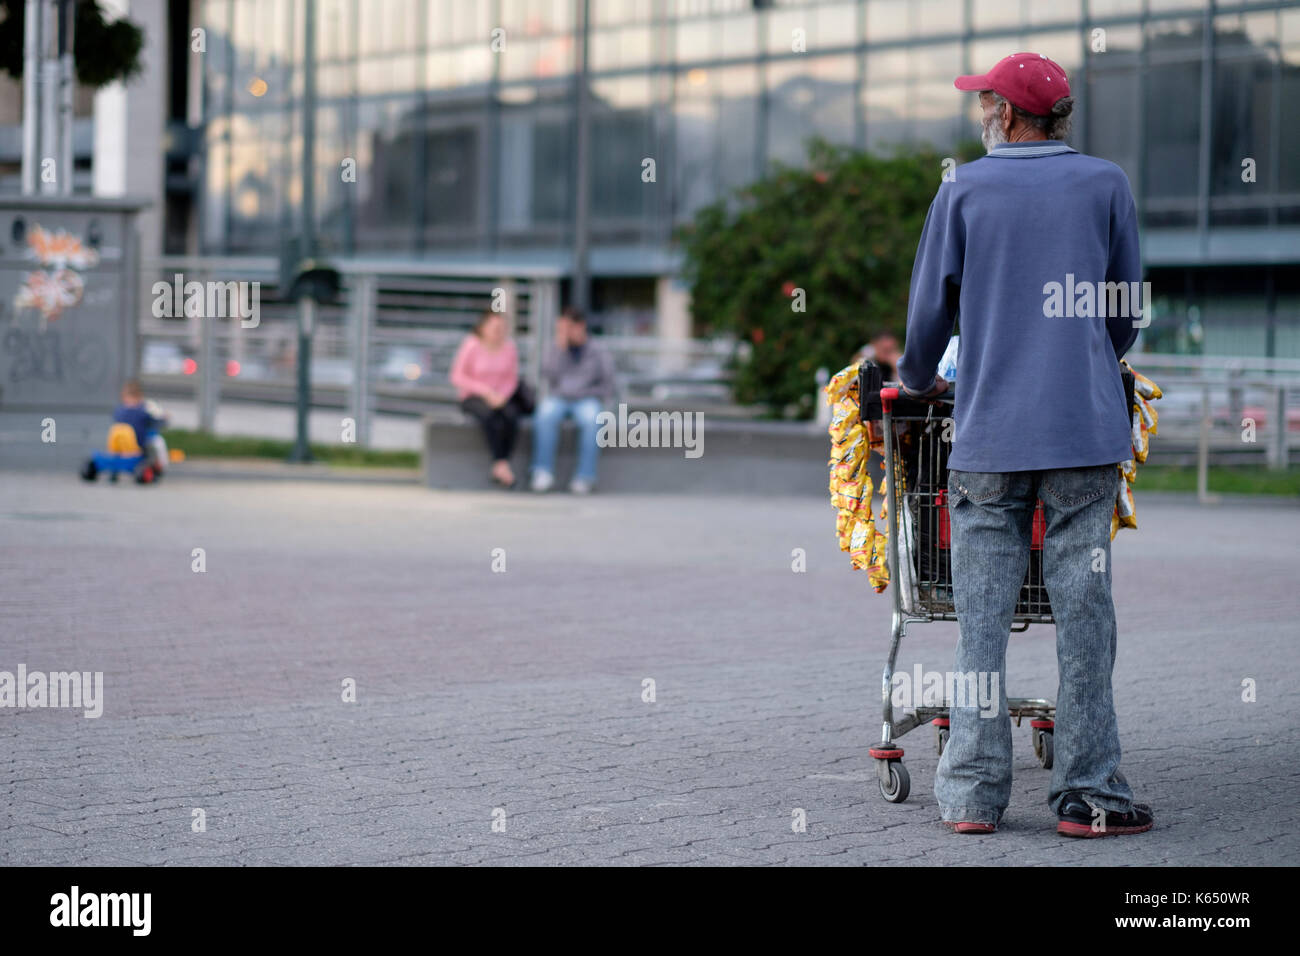 Venezuela, Caracas: street peddler with a cart in Plaza Venezuela square - Stock Image